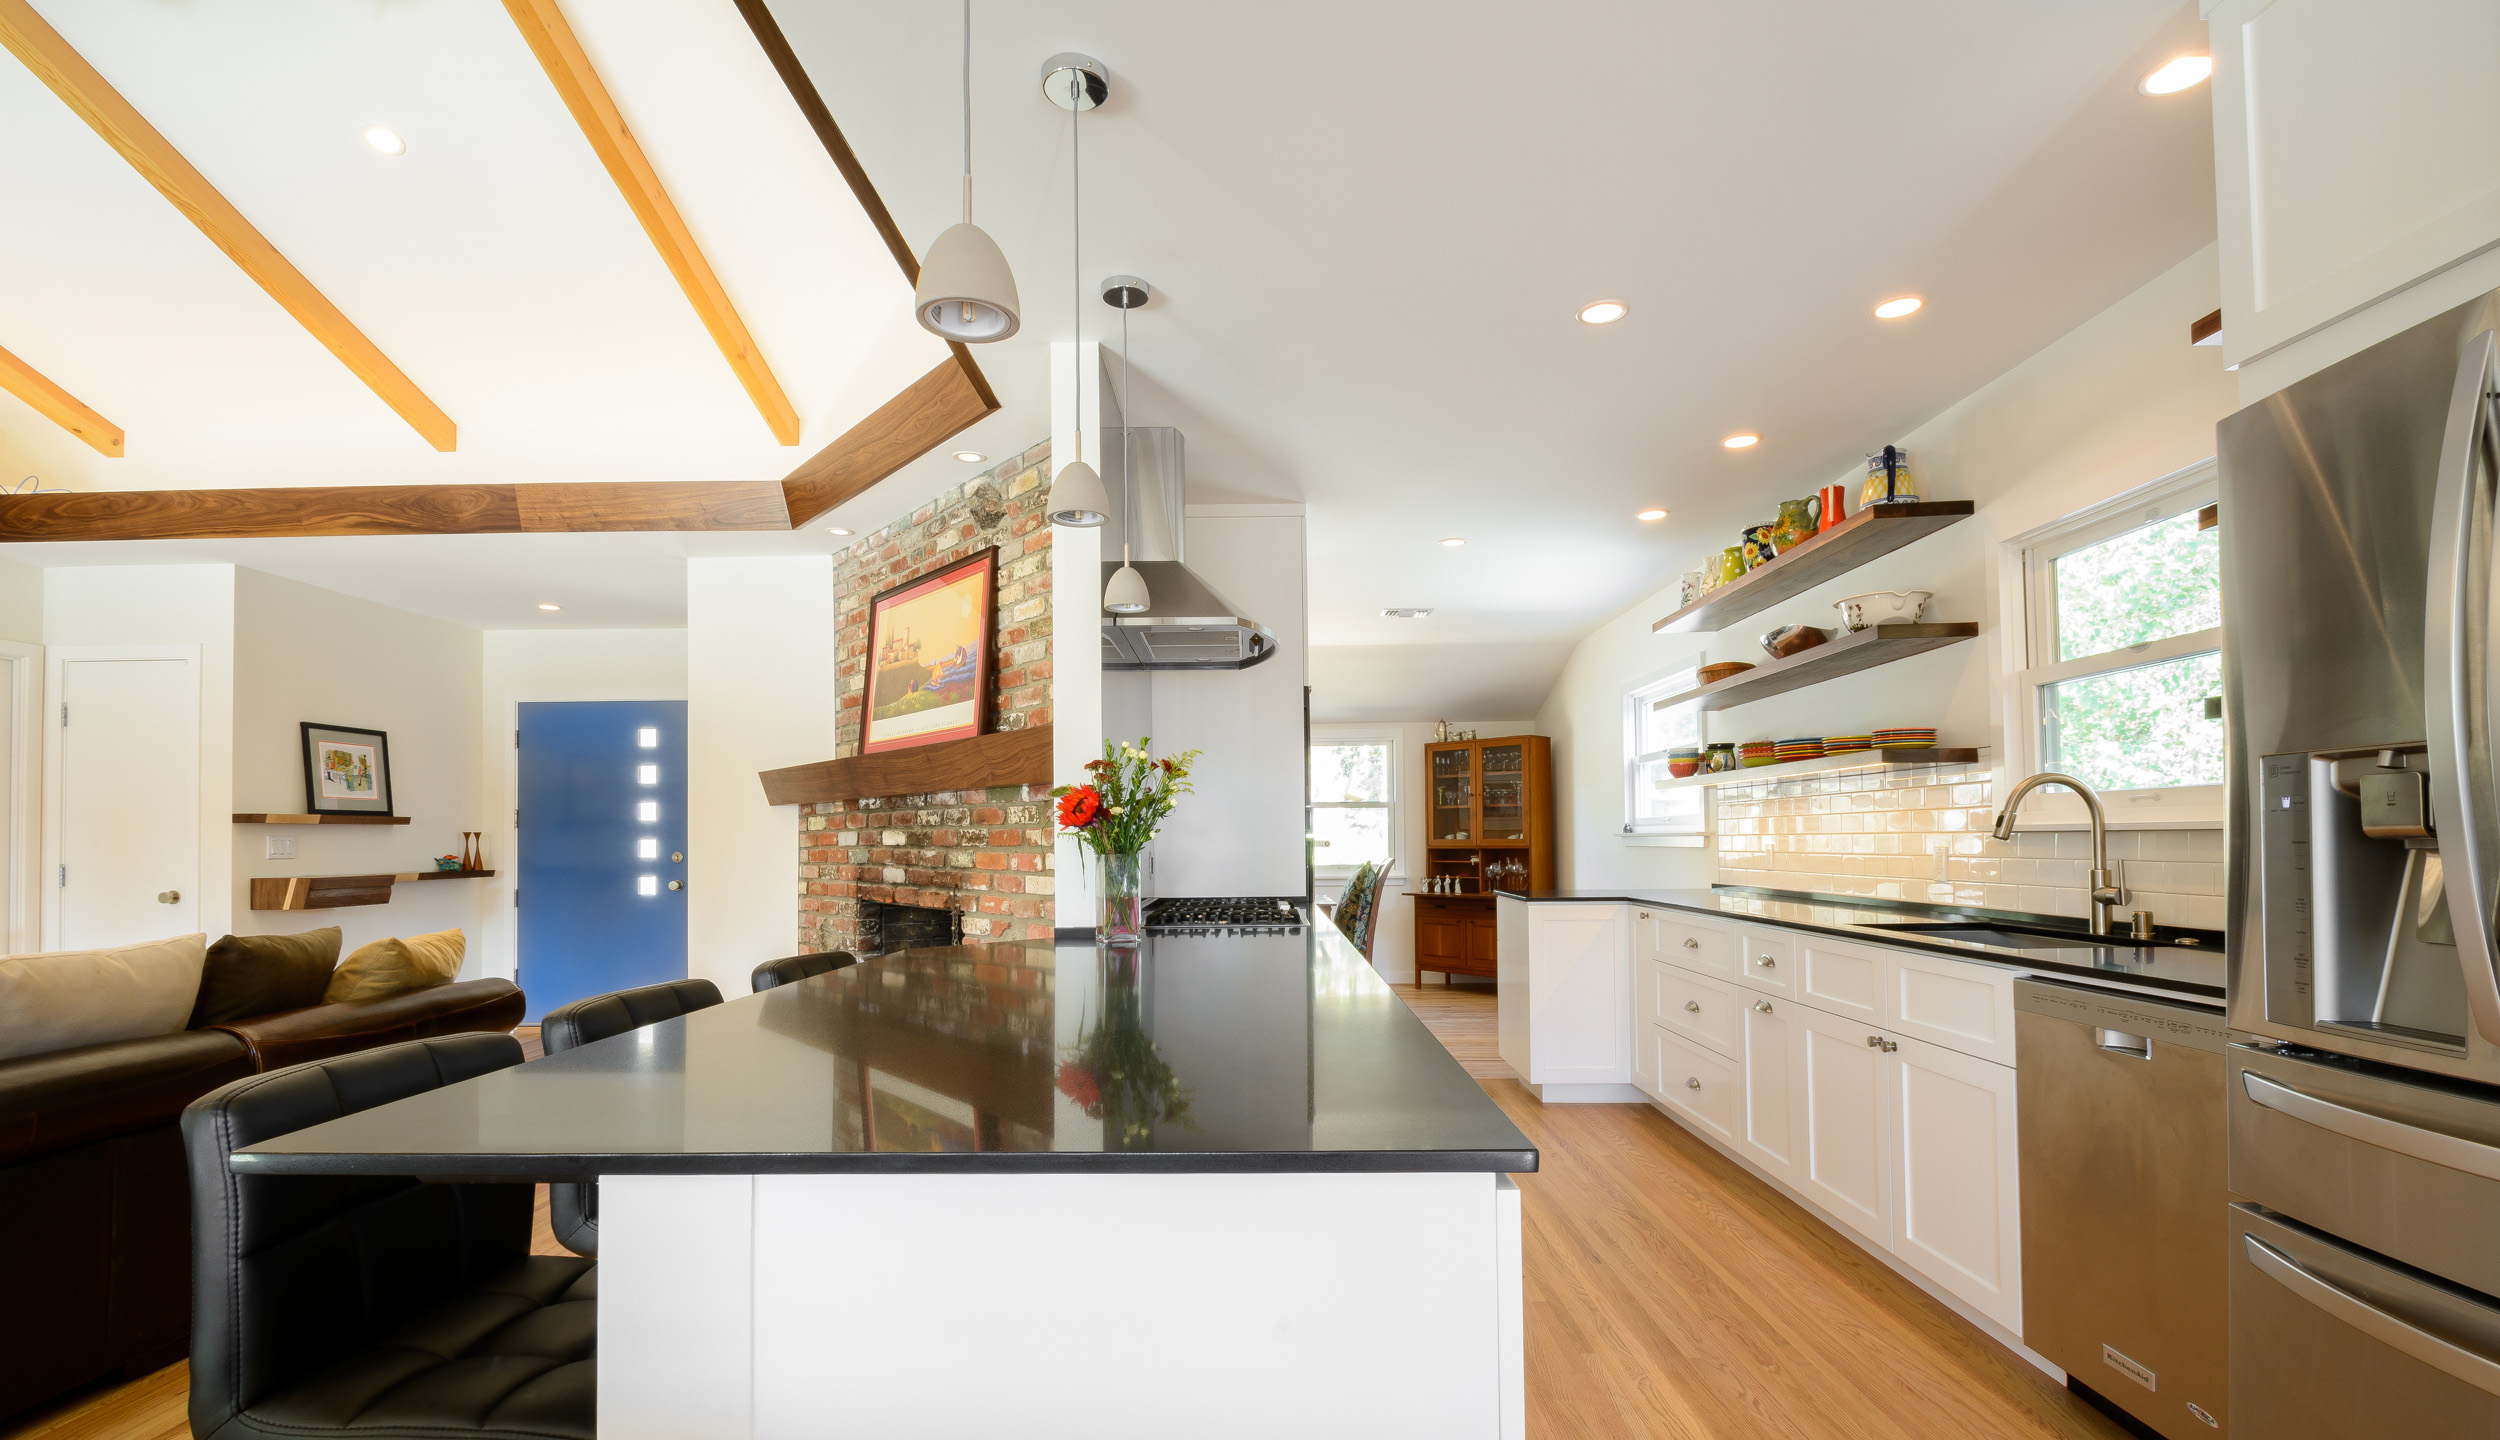 Kitchen Remodeling The Lotus Way | Design Build Remodeling ...